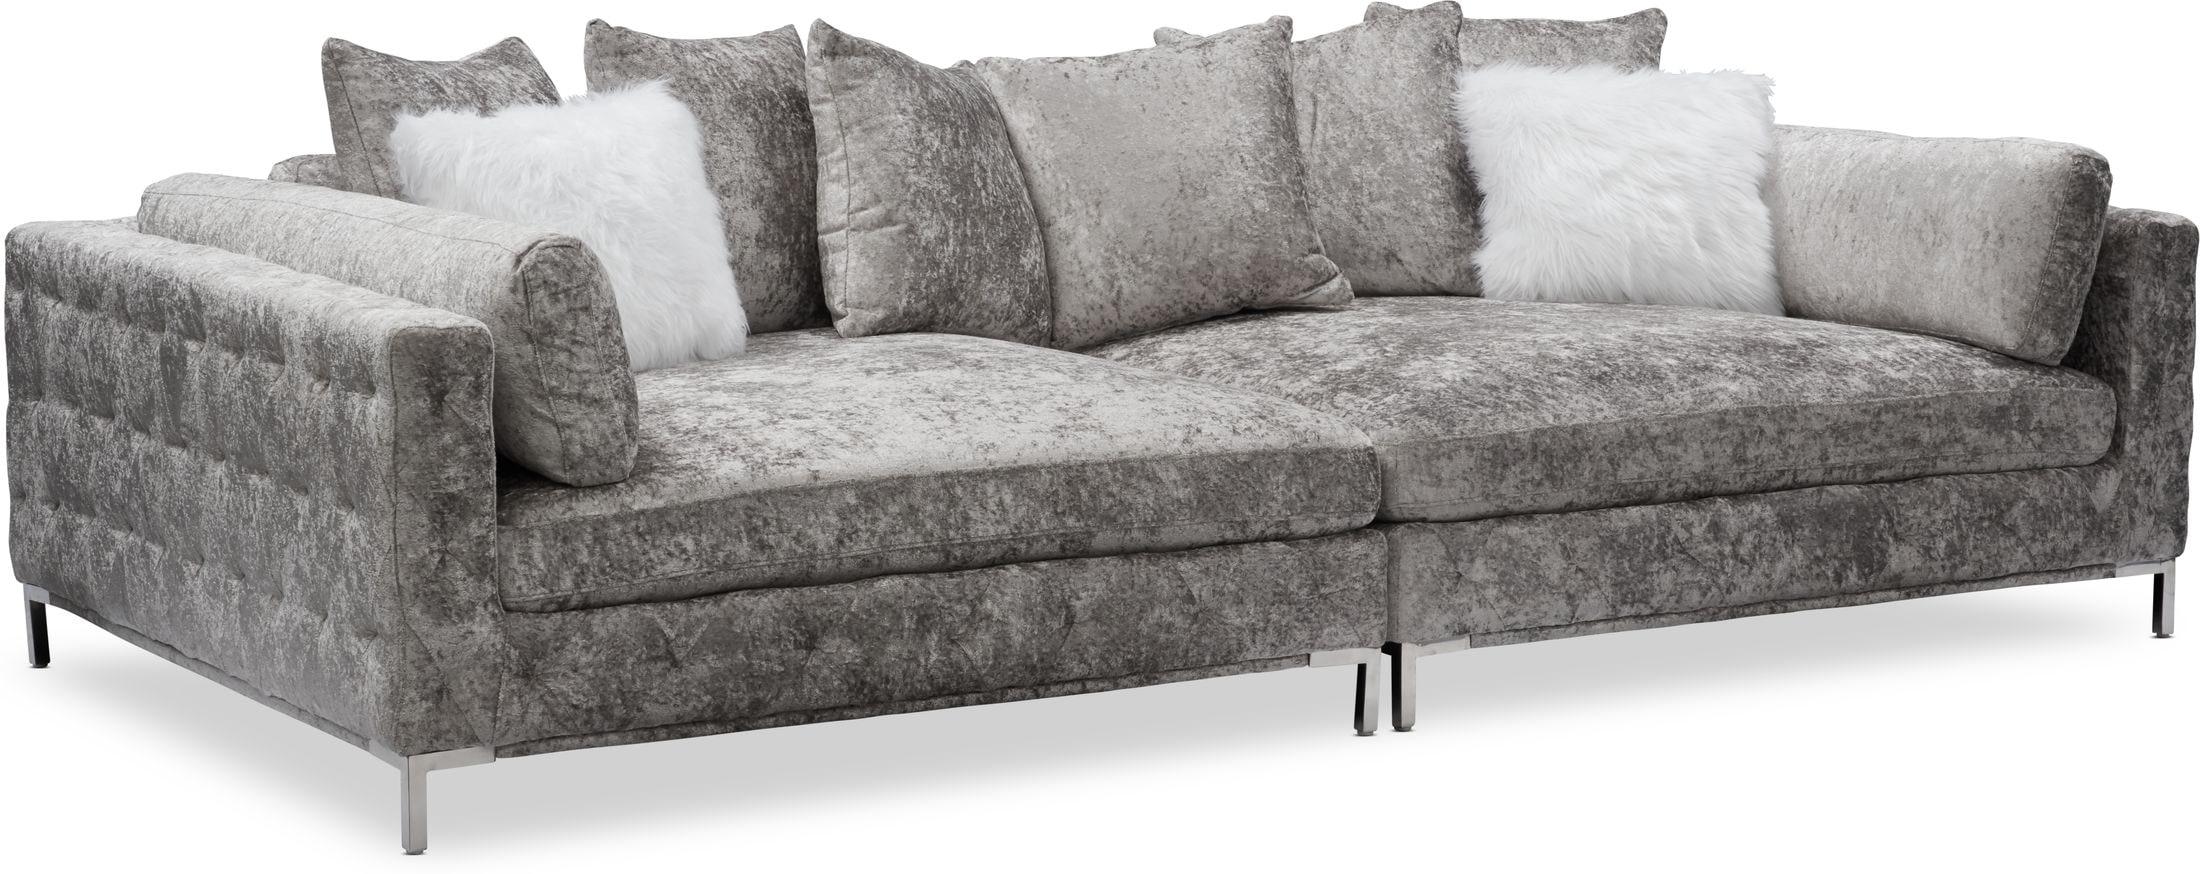 Living Room Furniture - Milan 2-Piece Sofa